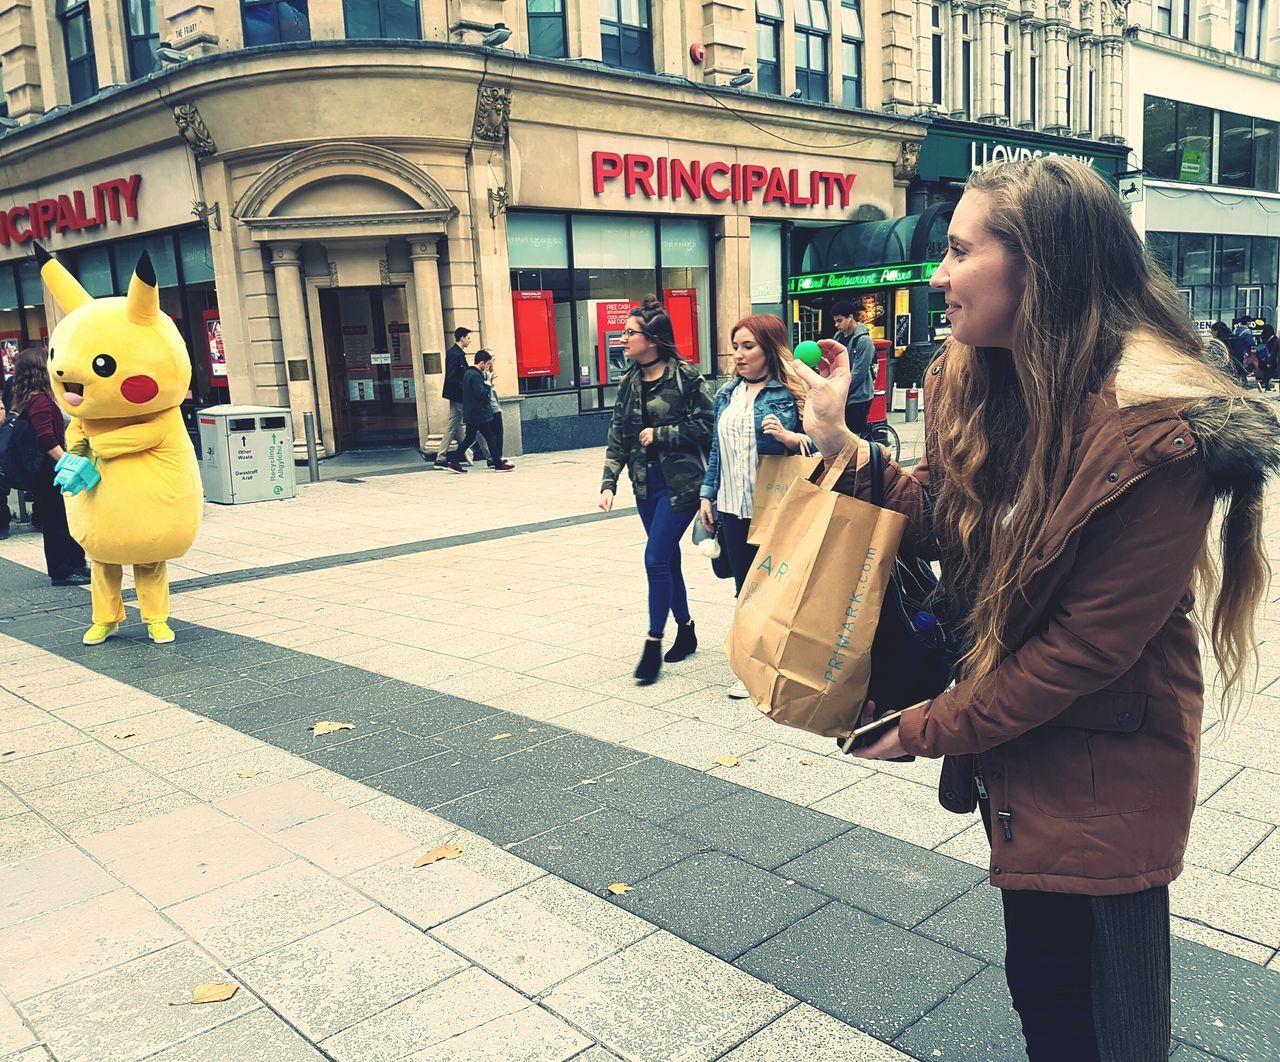 People City Walking Day Cardiff City Pokémon Pokemon Go Pikachu I Choose You